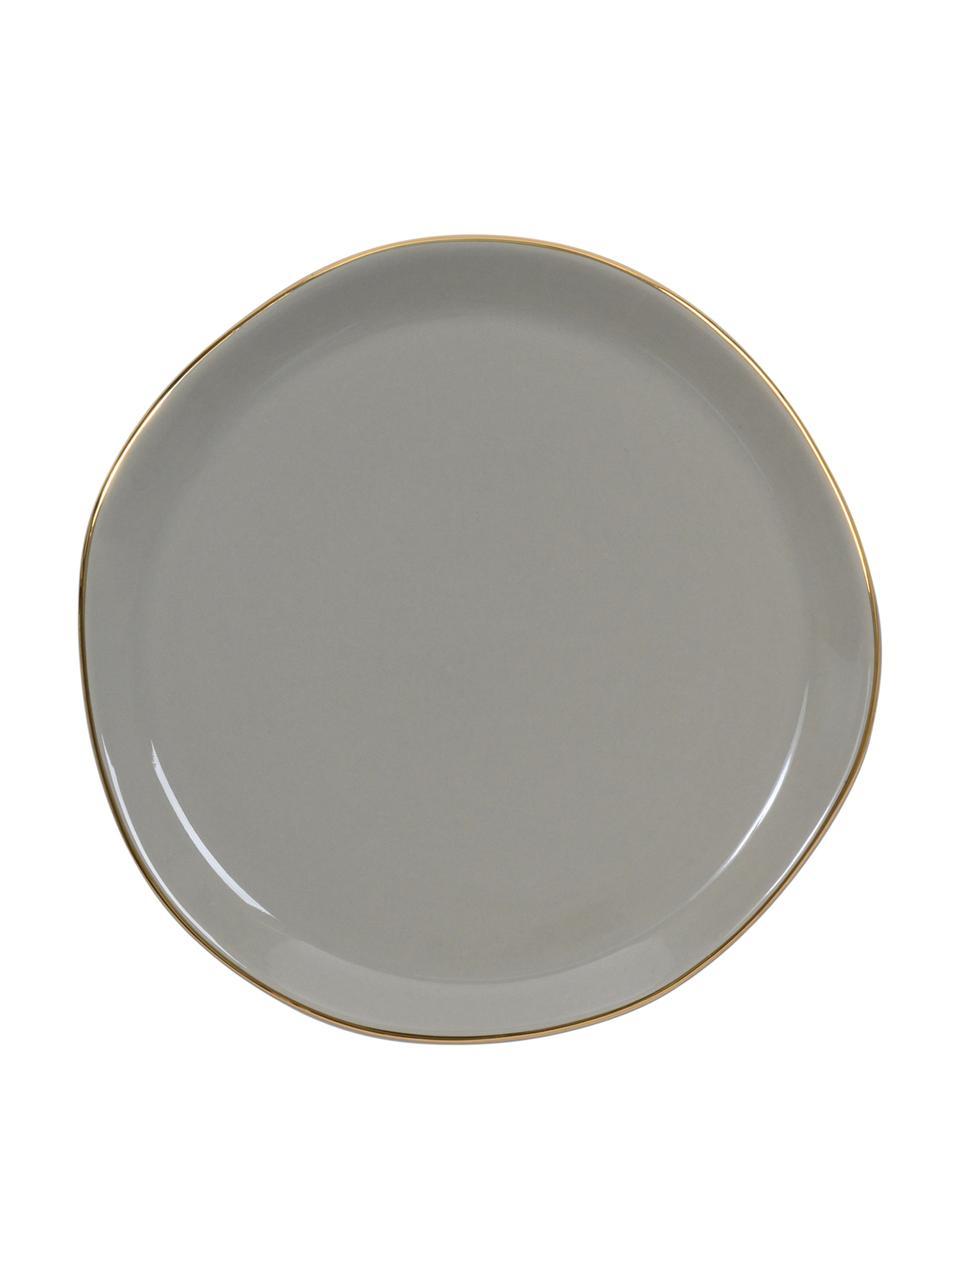 Kuchenteller Good Morning in Grau mit Goldrand, Porzellan, Grau, Goldfarben, Ø 17 cm